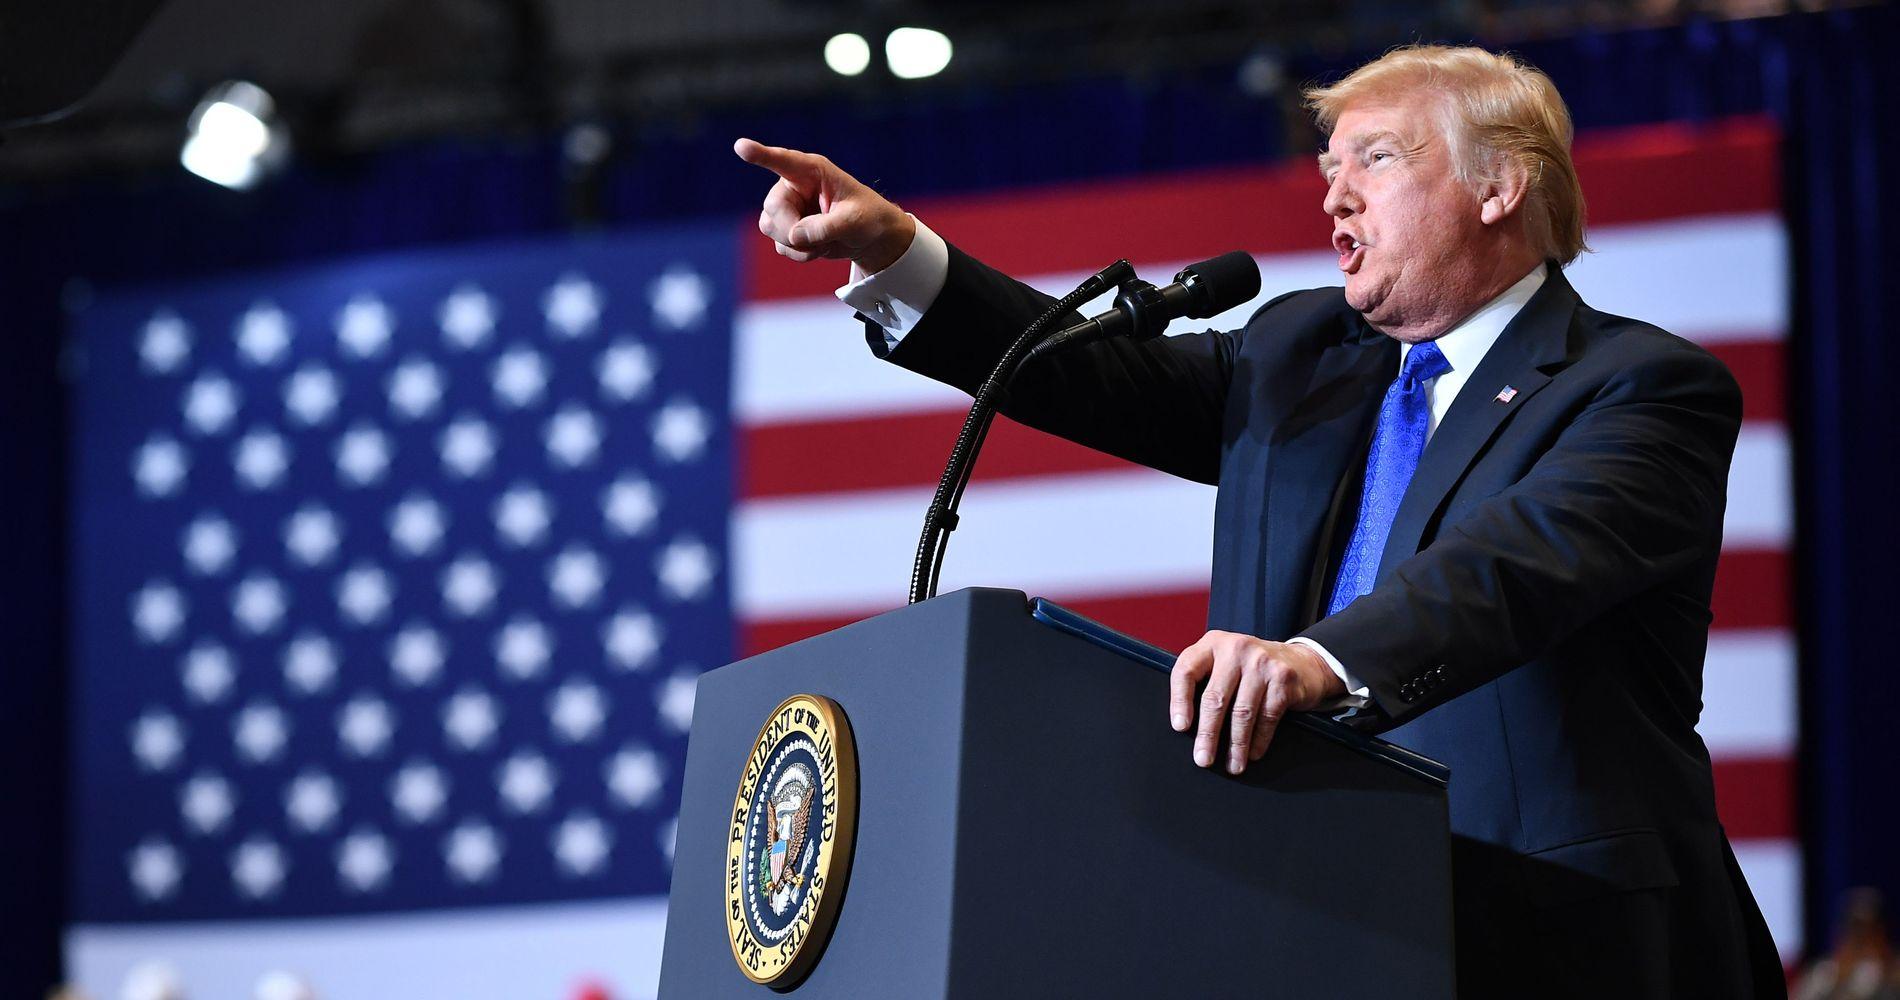 Trump Praises 'Great Gentleman' Brett Kavanaugh Despite Sexual Assault Allegation | HuffPost